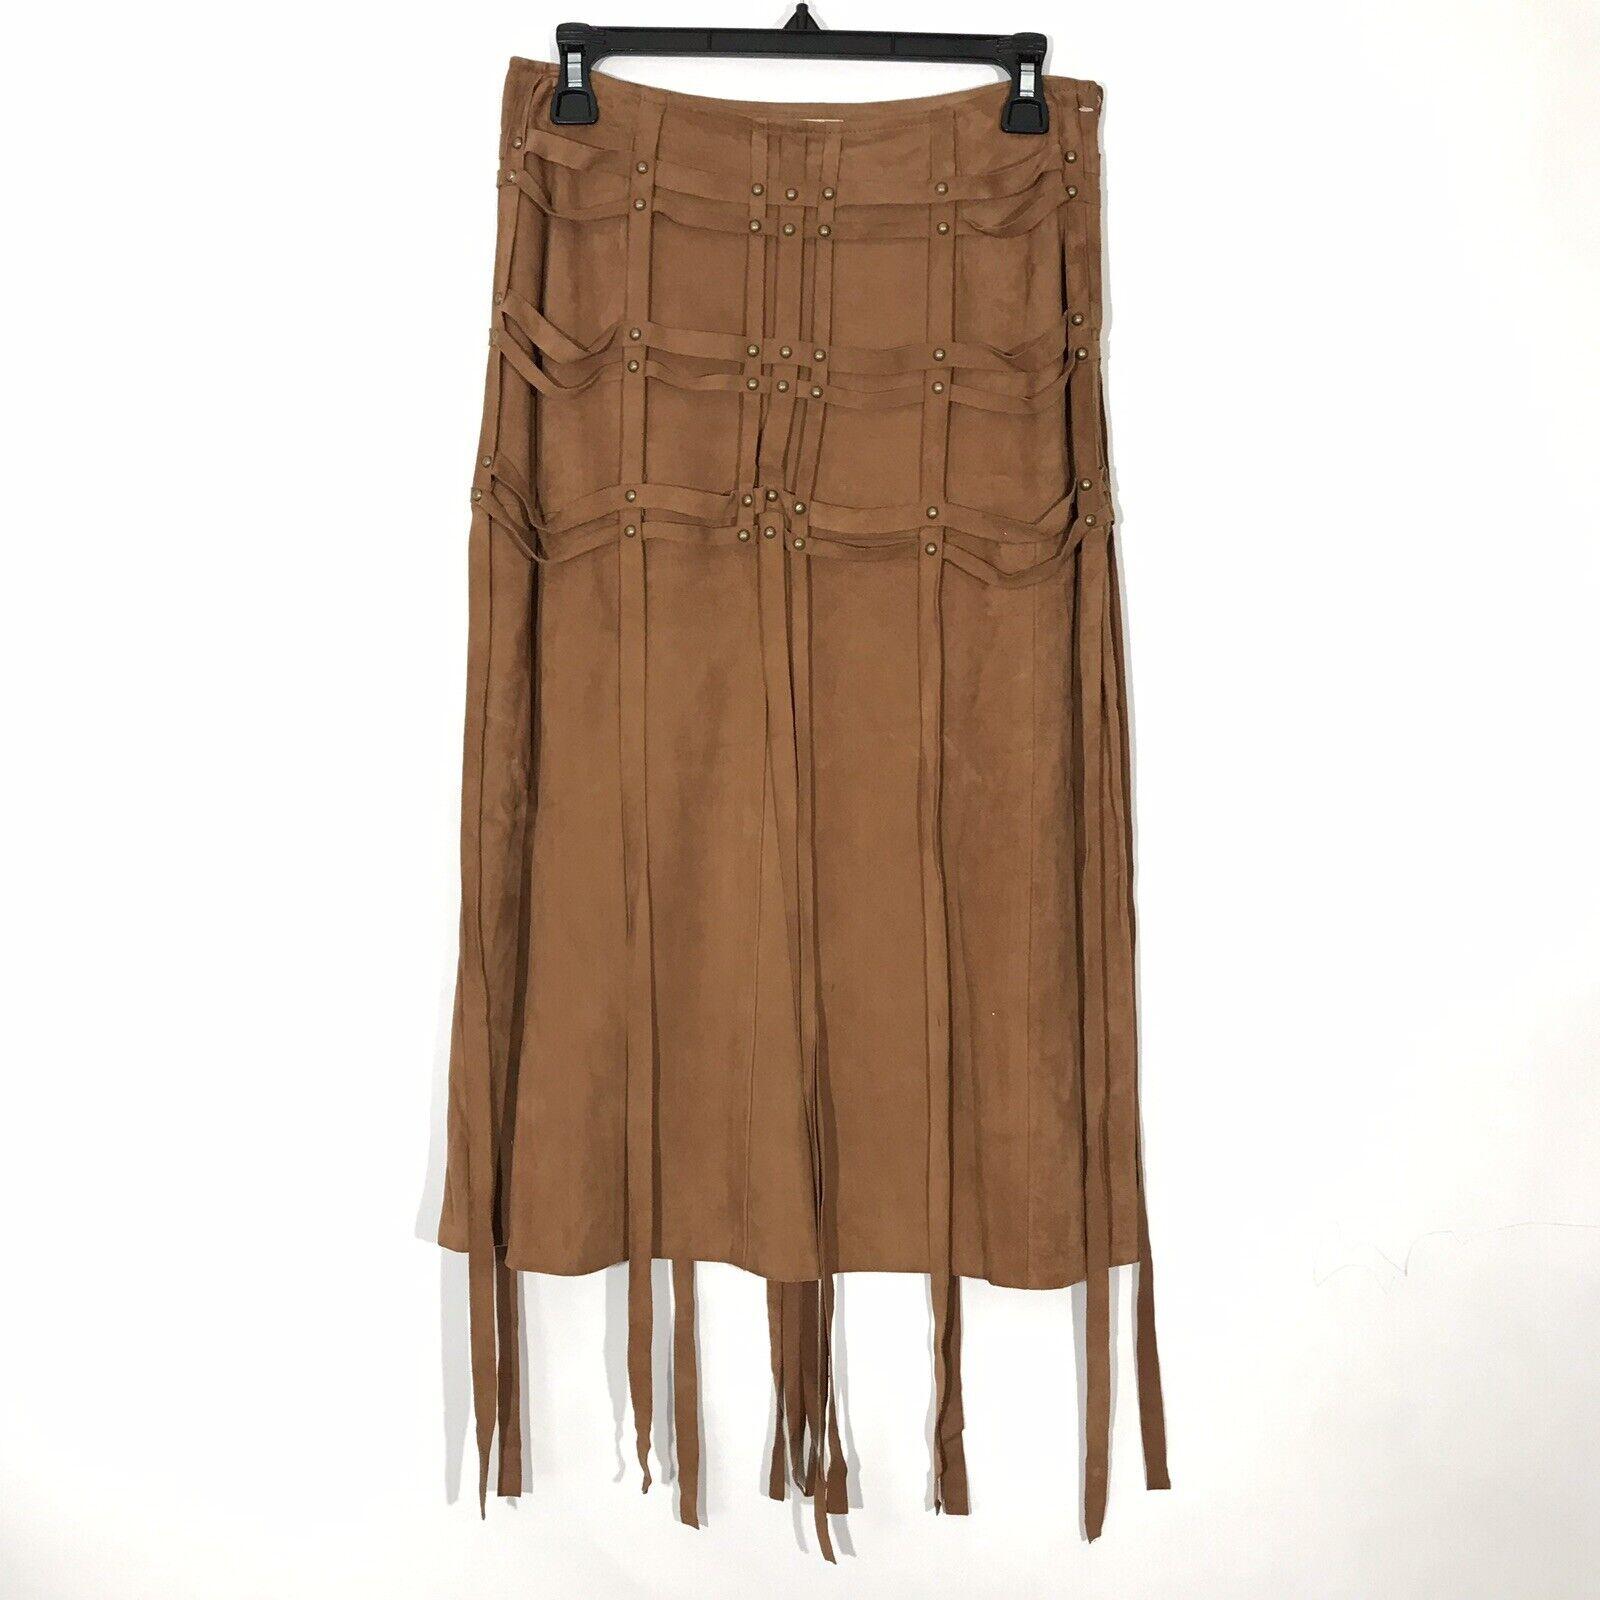 Haute Hippie Womens Goat Suede Pencil Skirt Size 2 Brown Plaid Harness